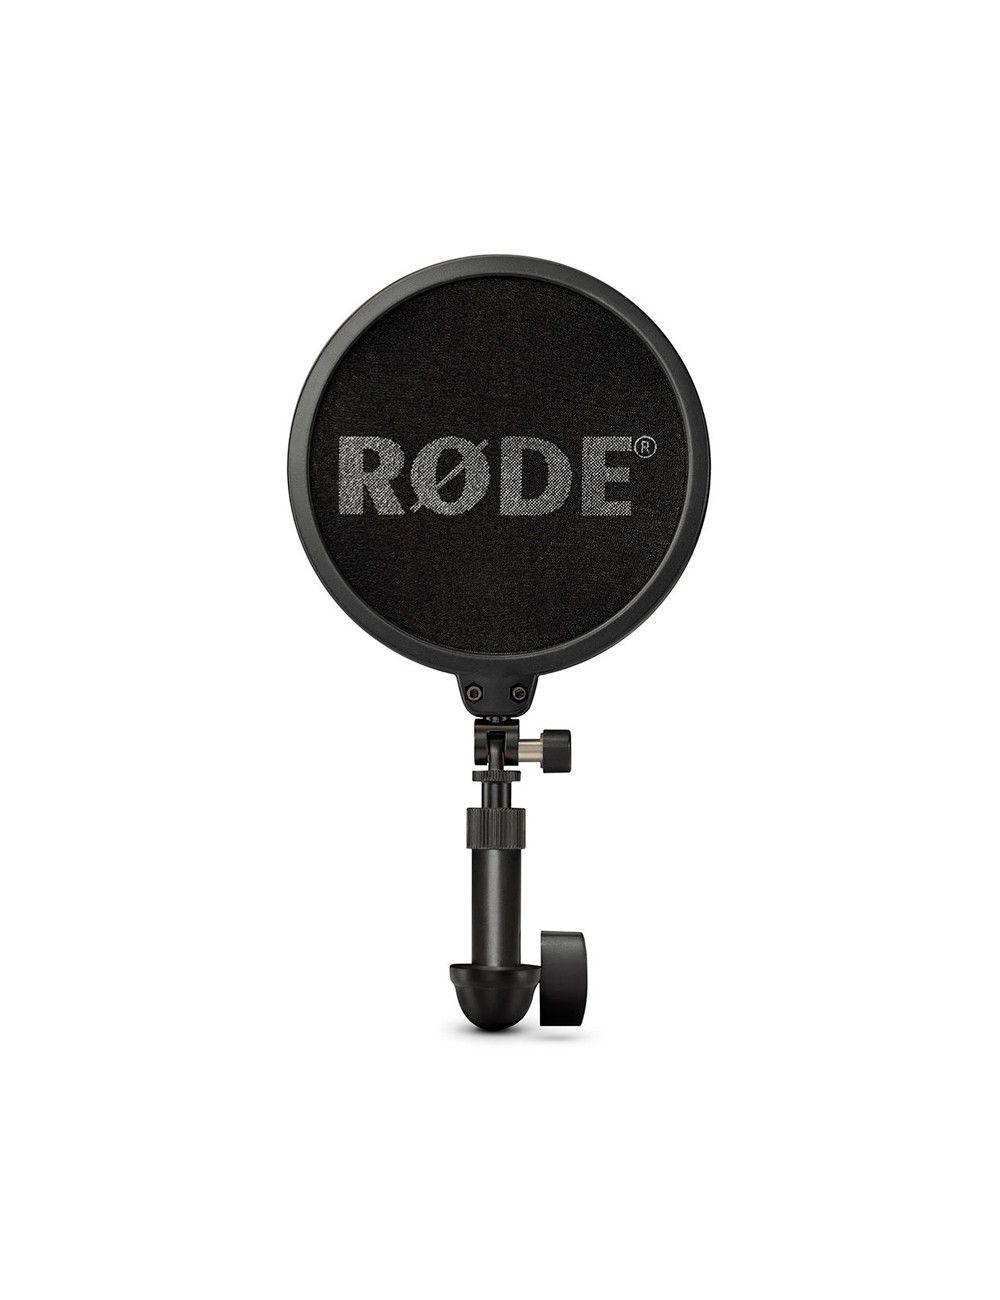 Rode Wireless GO Micrófono Inalámbrico en Chile Apertura.cl